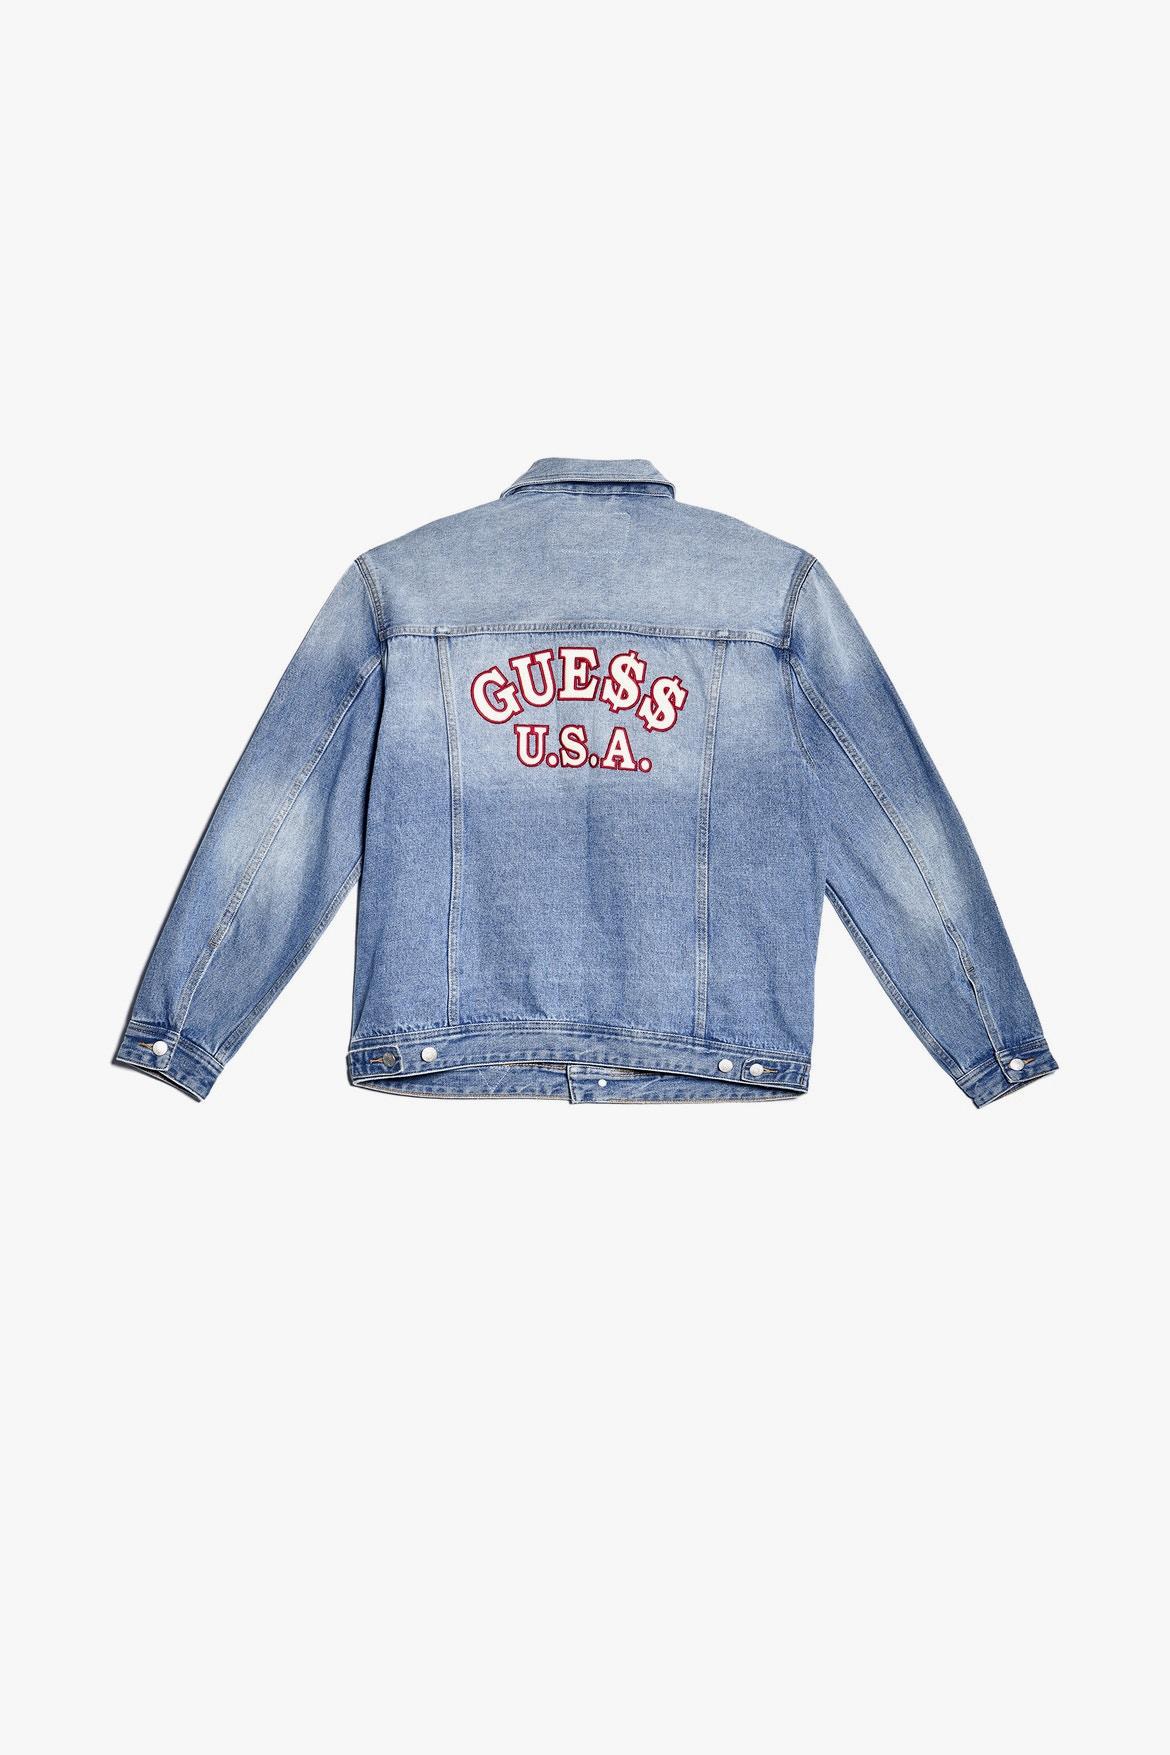 AG jean jacket